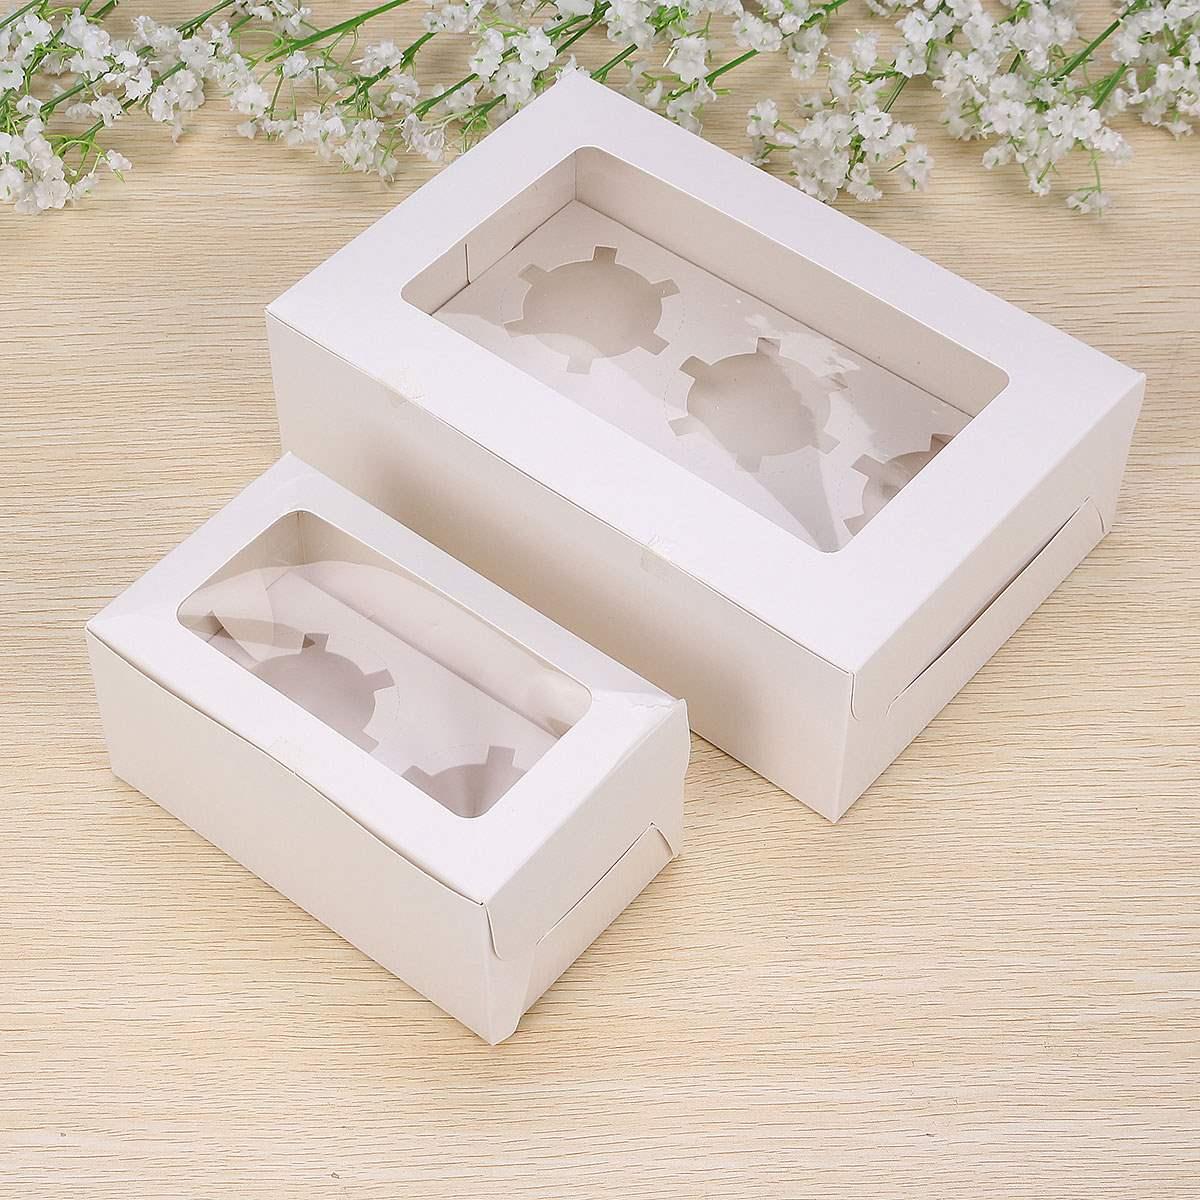 Attractive Wedding Cake Box Image - The Wedding Ideas ...